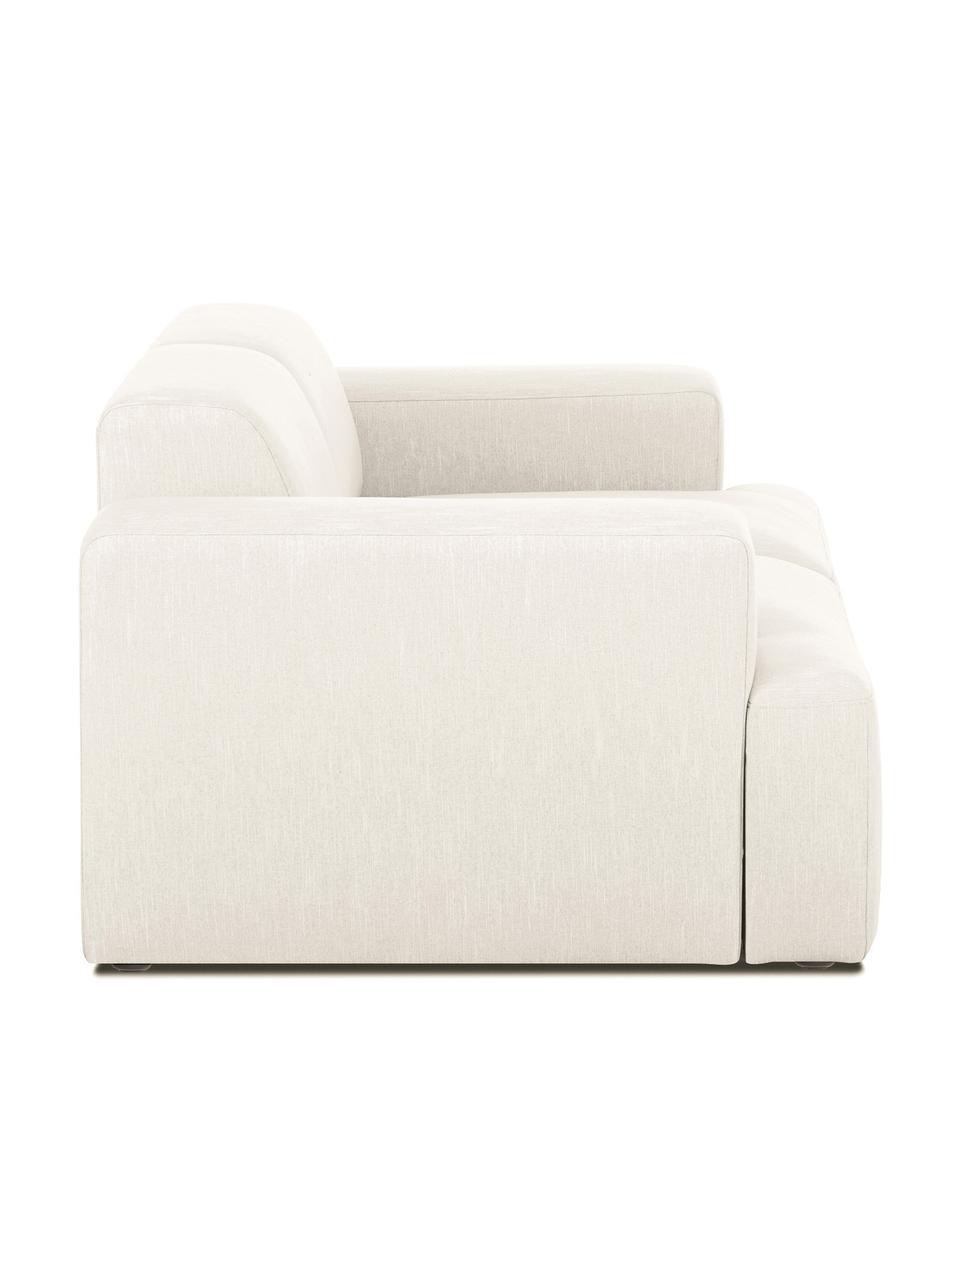 Sofa Melva (2-Sitzer) in Beige, Bezug: 100% Polyester Der hochwe, Gestell: Massives Kiefernholz, FSC, Füße: Kunststoff, Webstoff Beige, B 198 x T 101 cm